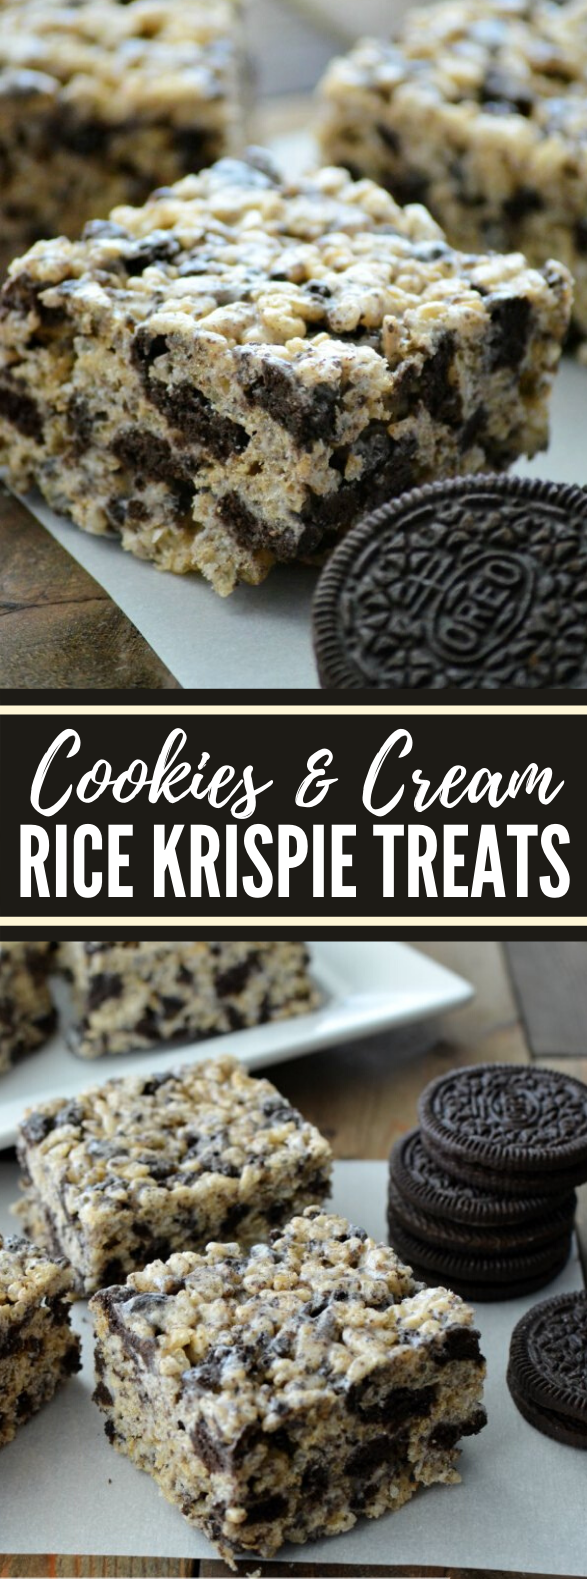 Cookies & Cream Rice Krispie Treats #desserts #oreo